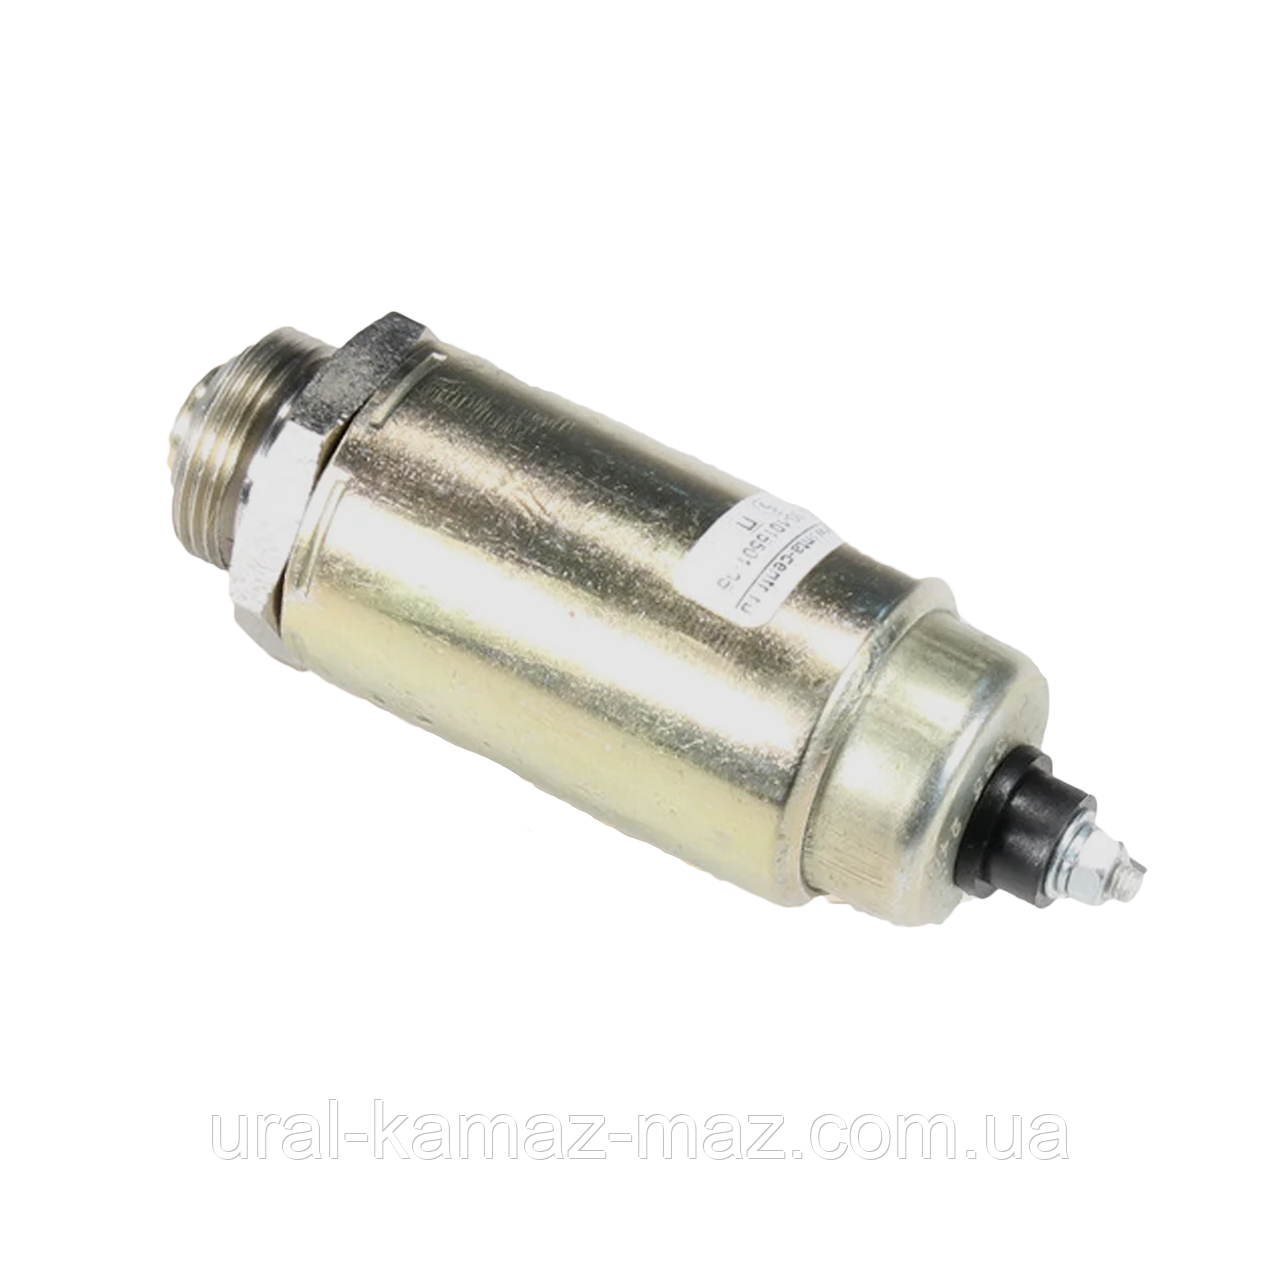 ПЖД30-1015501-05 Электромагнит с клапаном